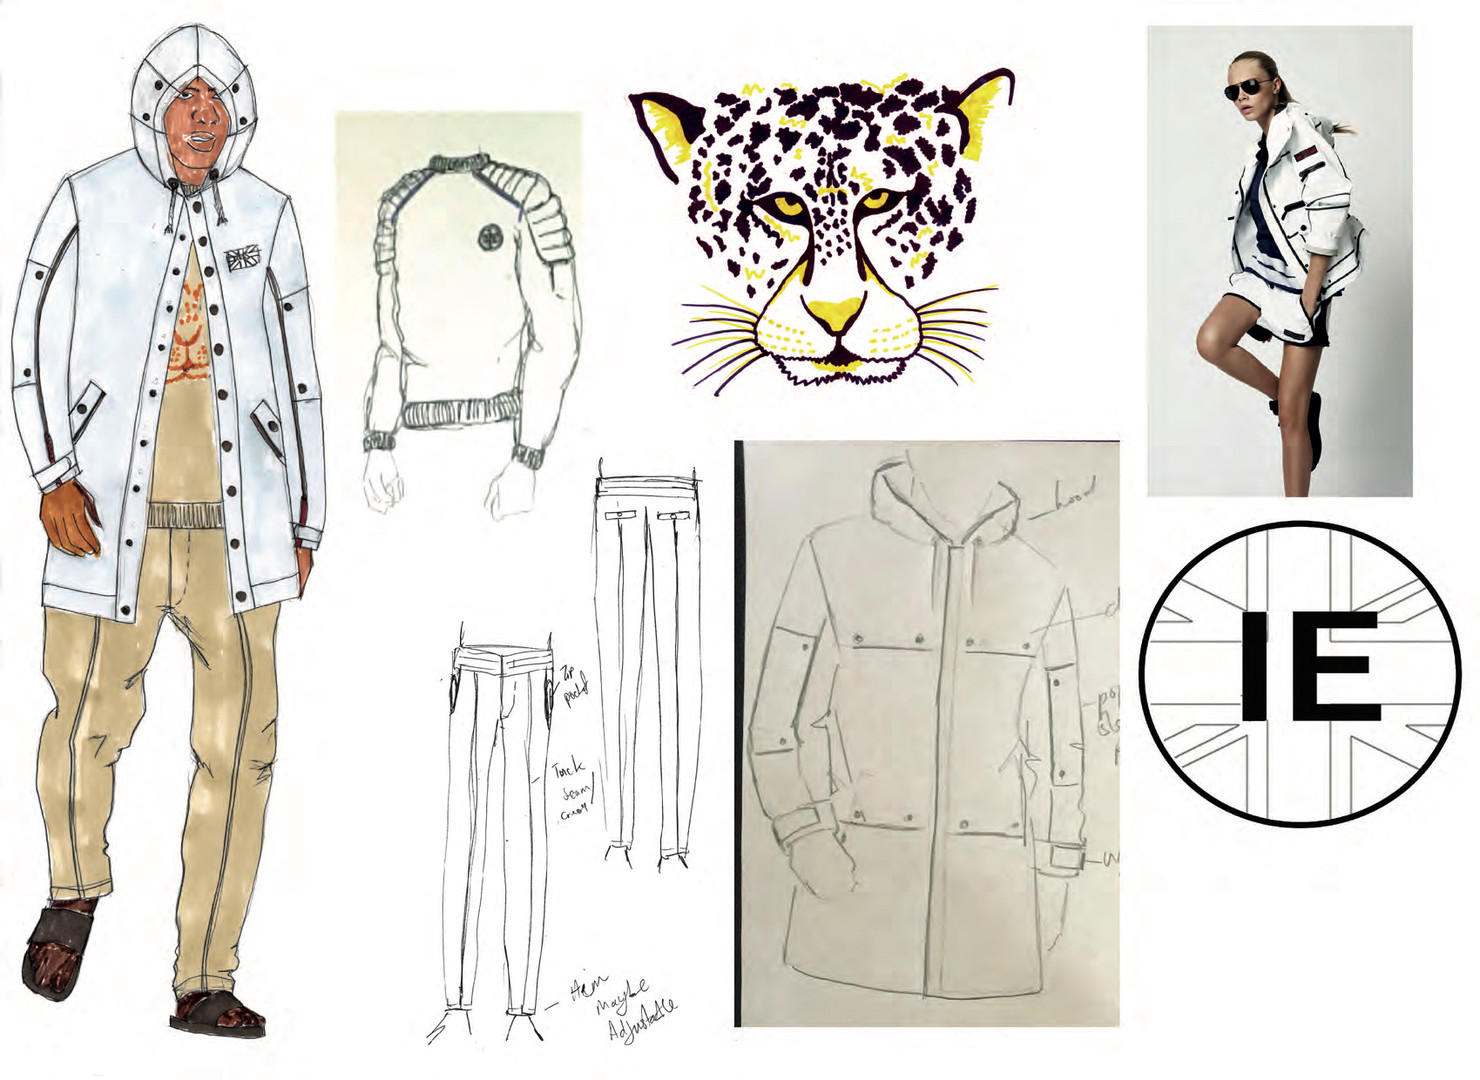 SD x IE - Outfit 2 design development